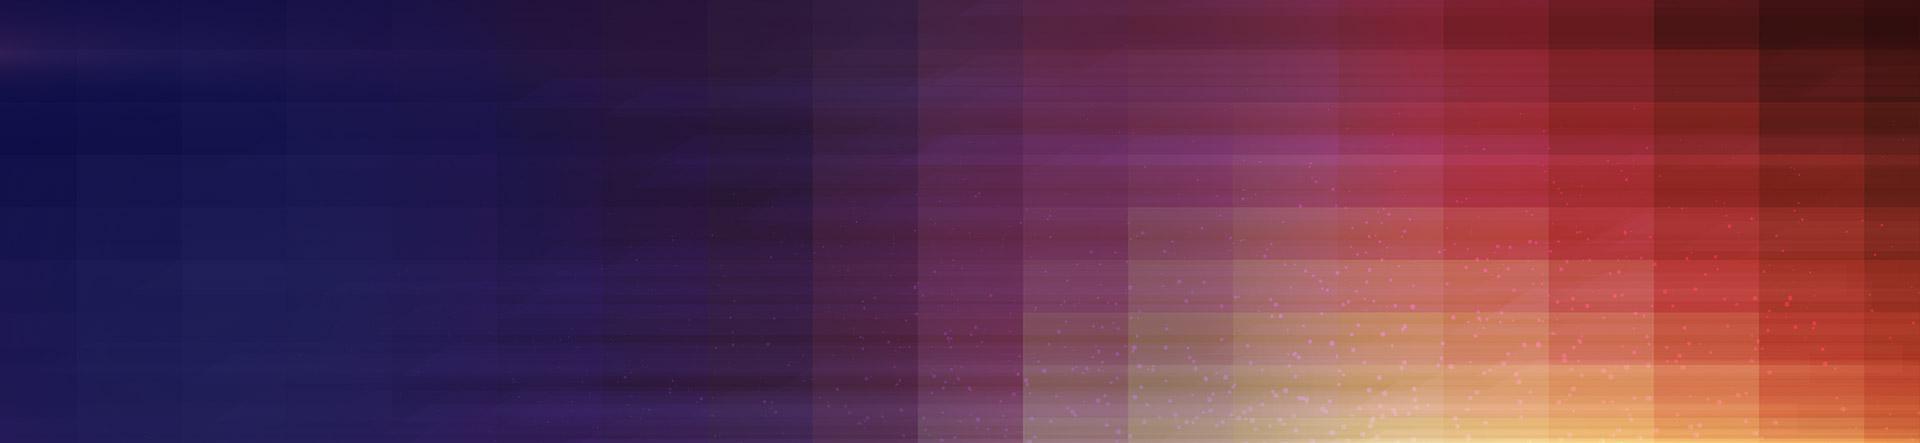 Color block blue, purple, red, orange, yellow banner